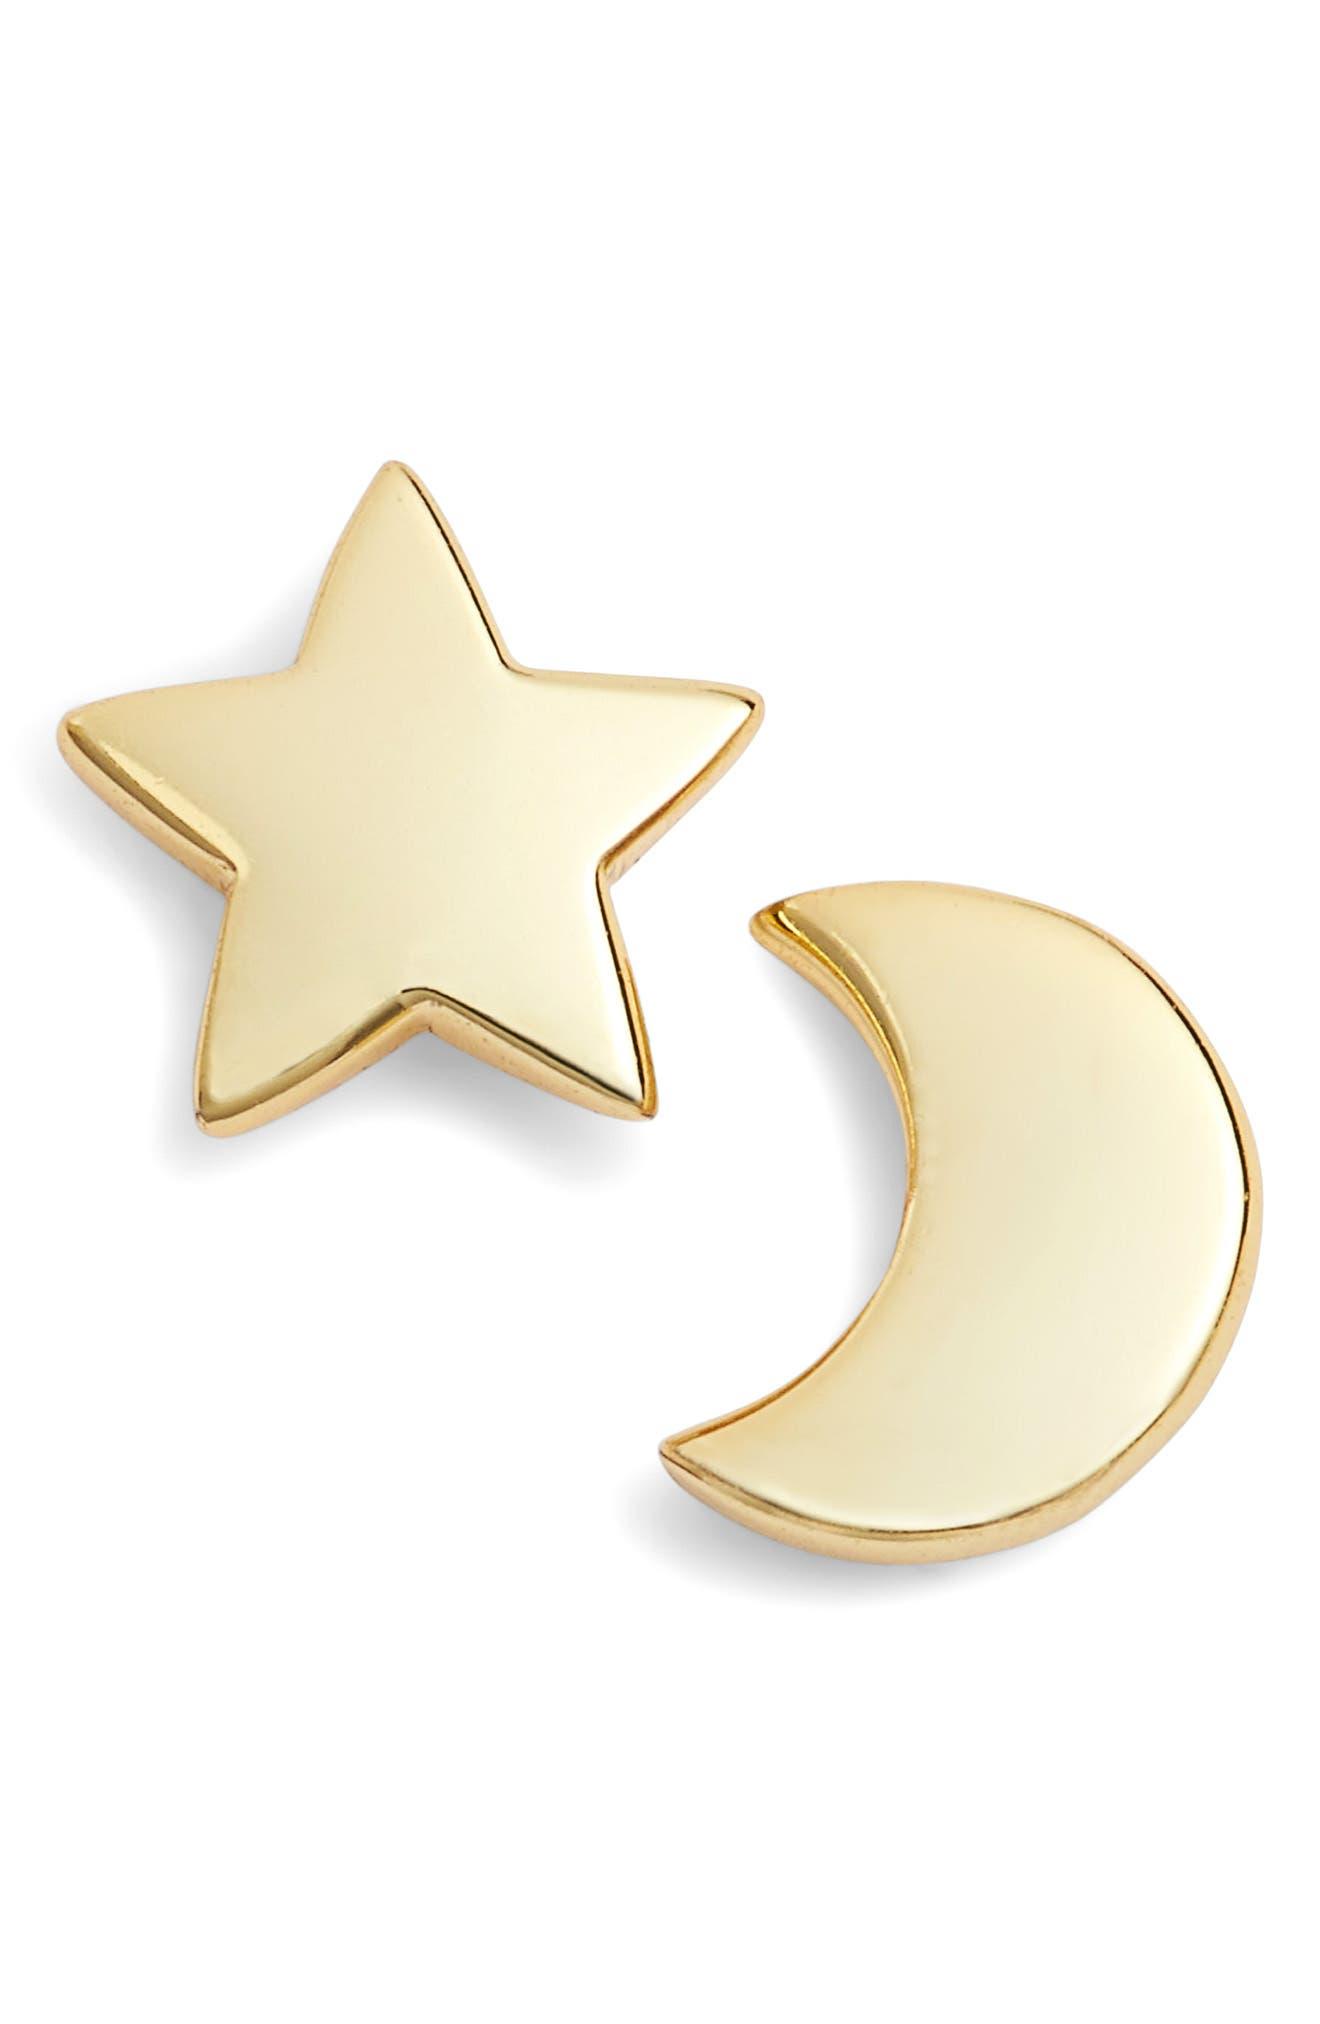 Moon & Star Stud Earrings,                             Main thumbnail 1, color,                             Gold